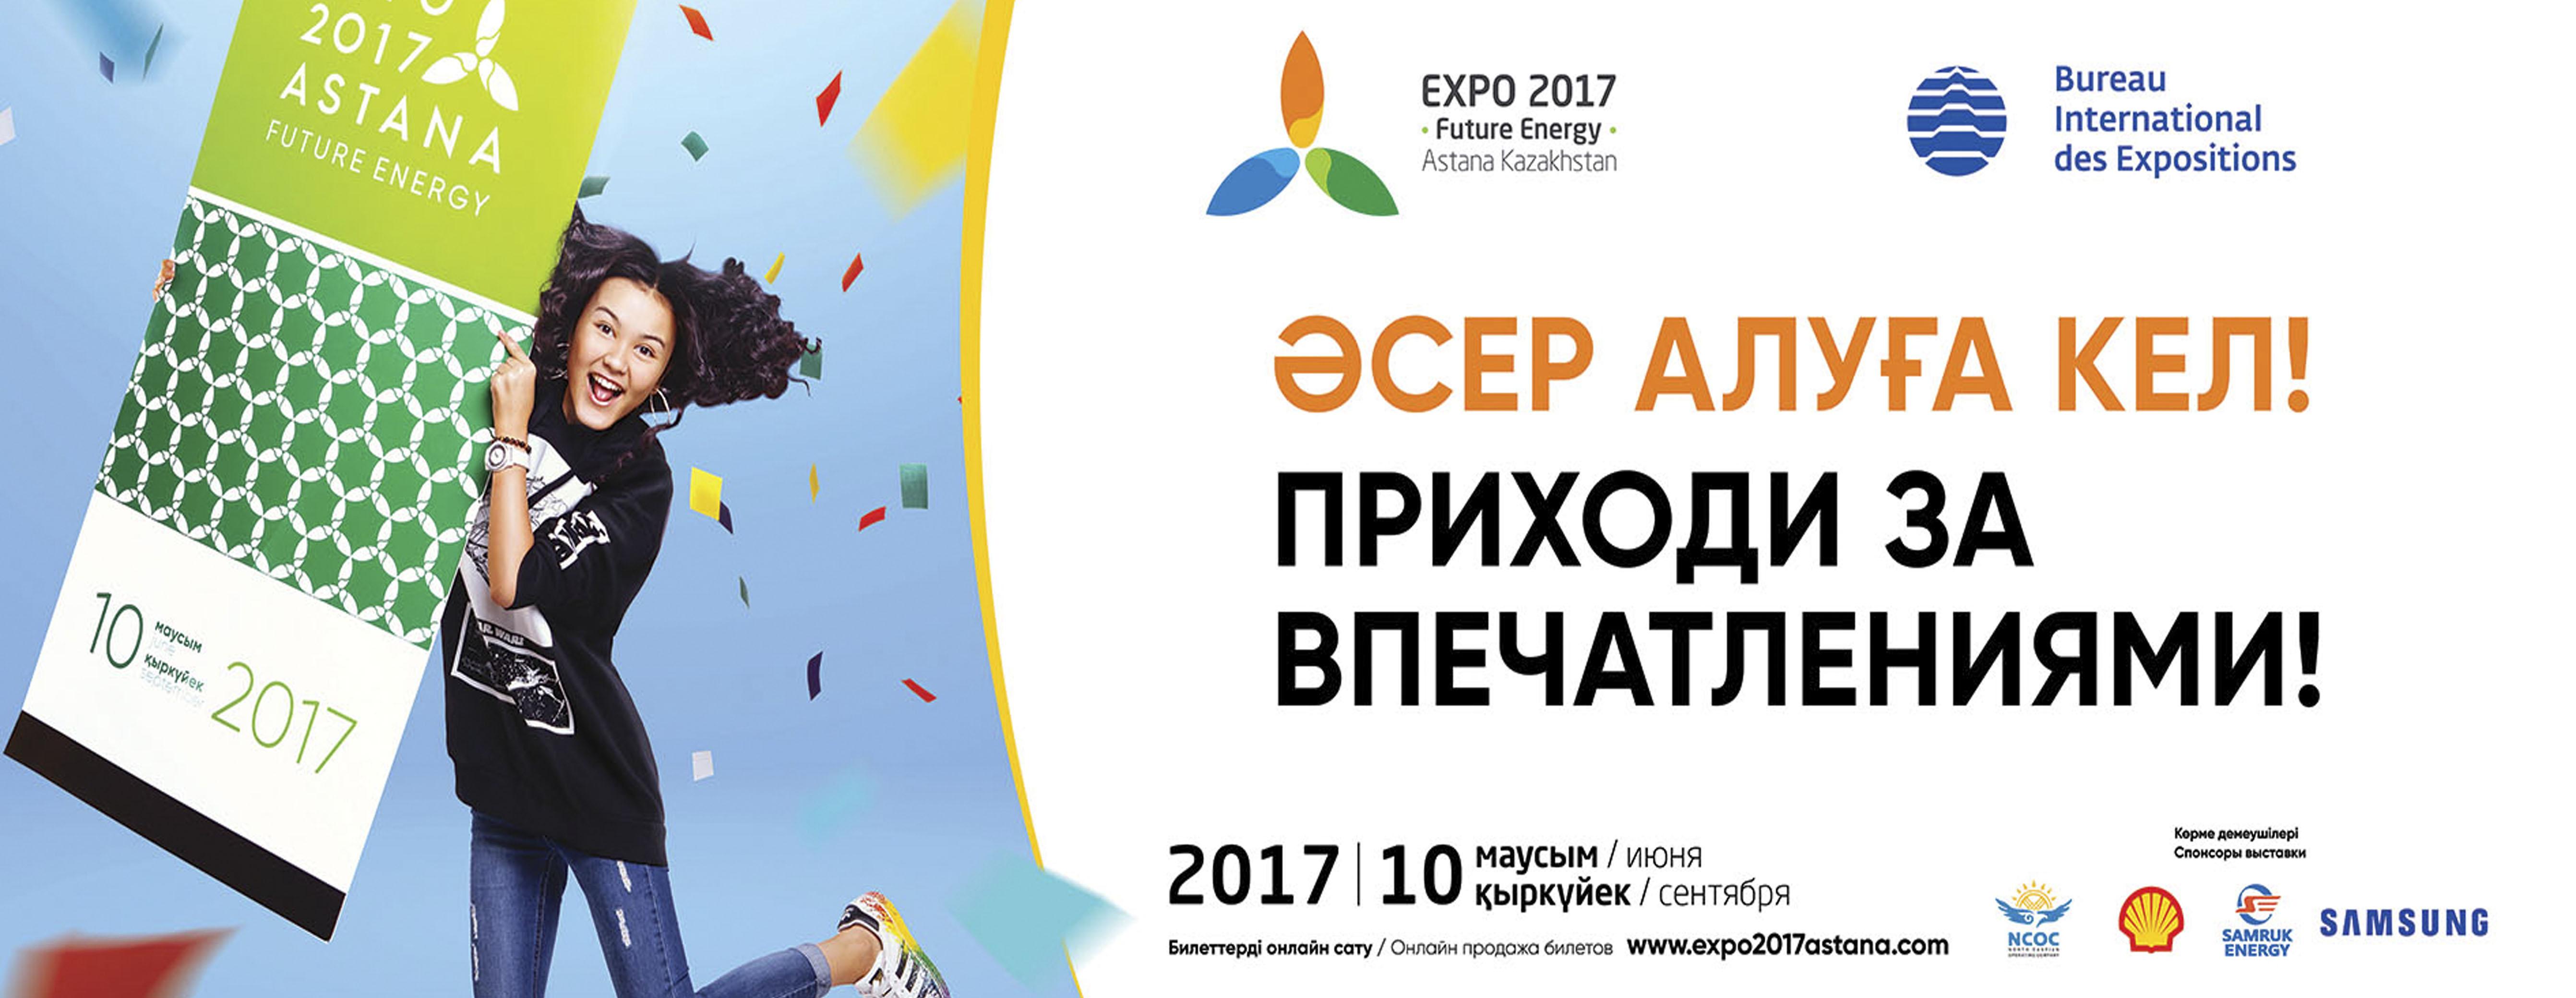 ЭКСПО-2017